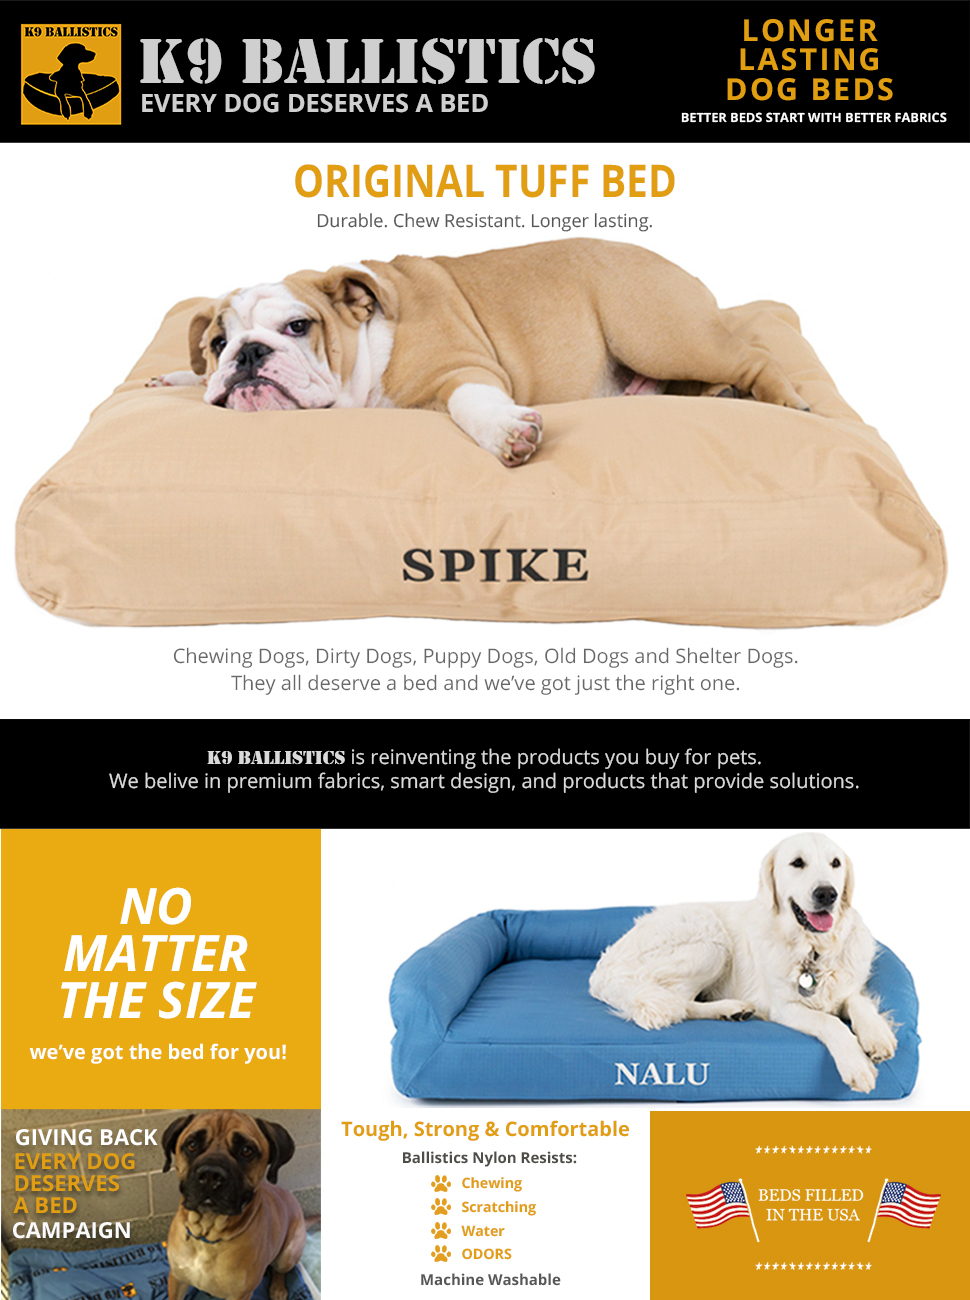 Amazoncom k9 ballistics original tuff bed tan large for Ballistic dog